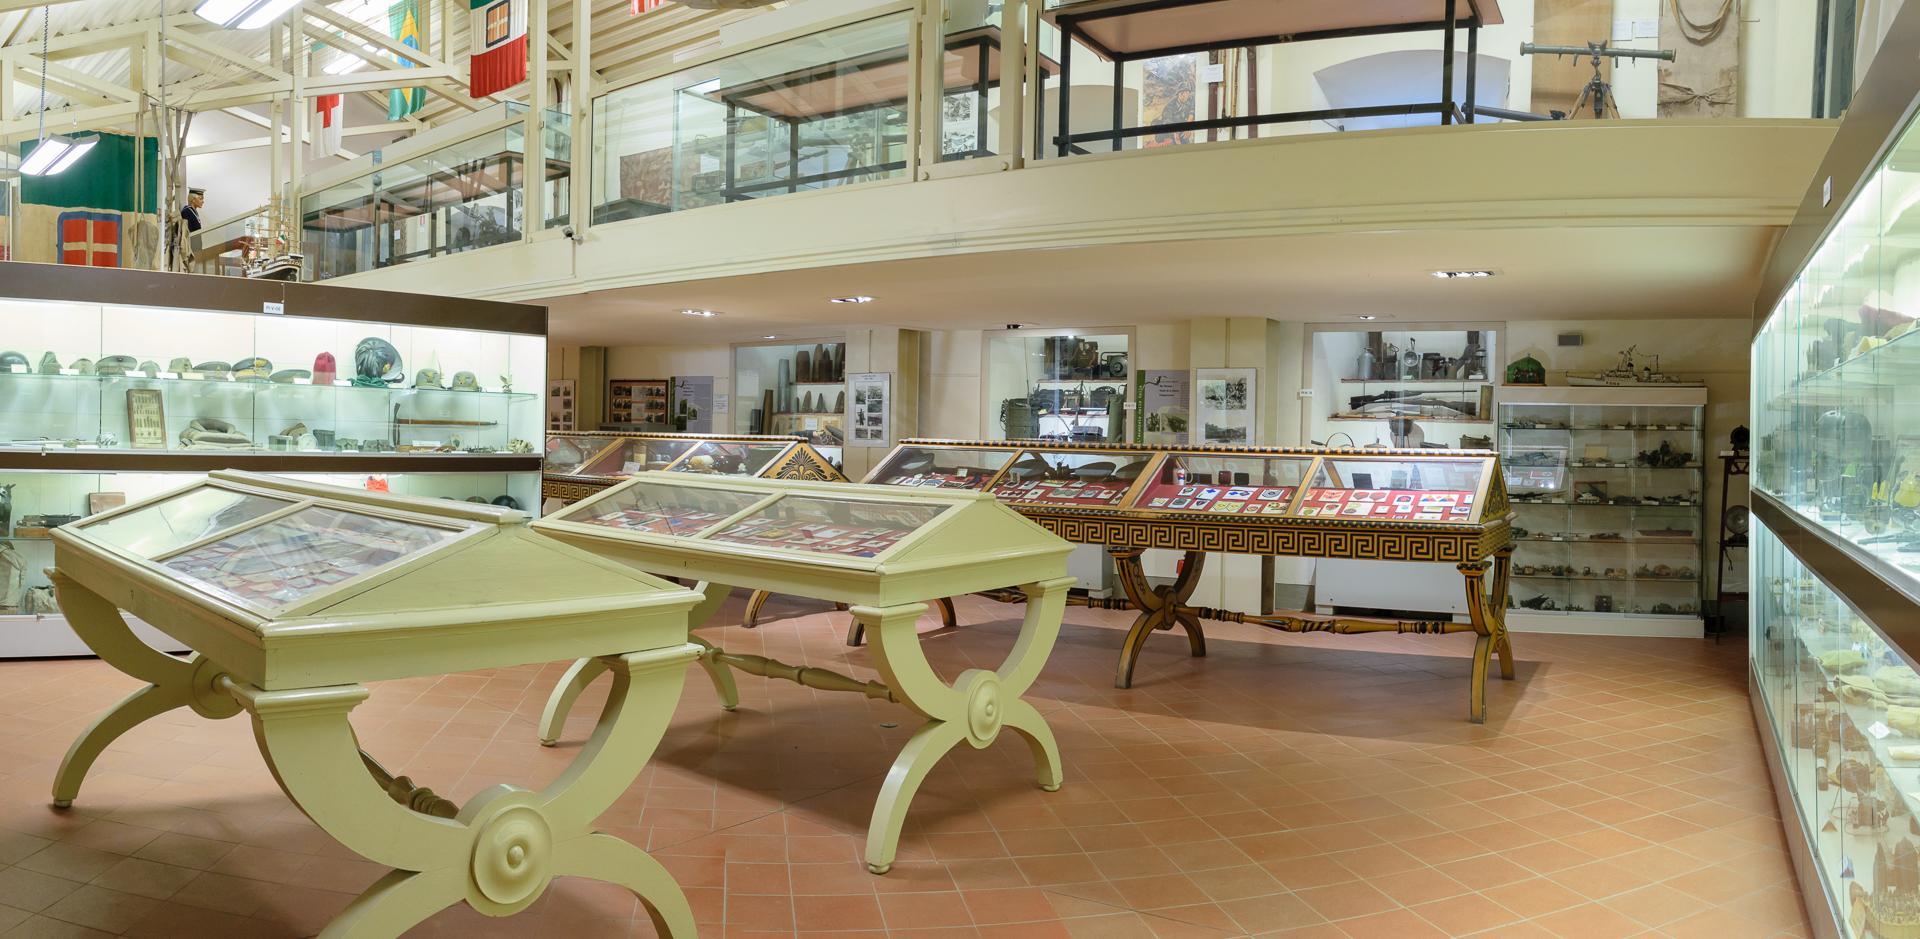 Museum of Castel Del Rio